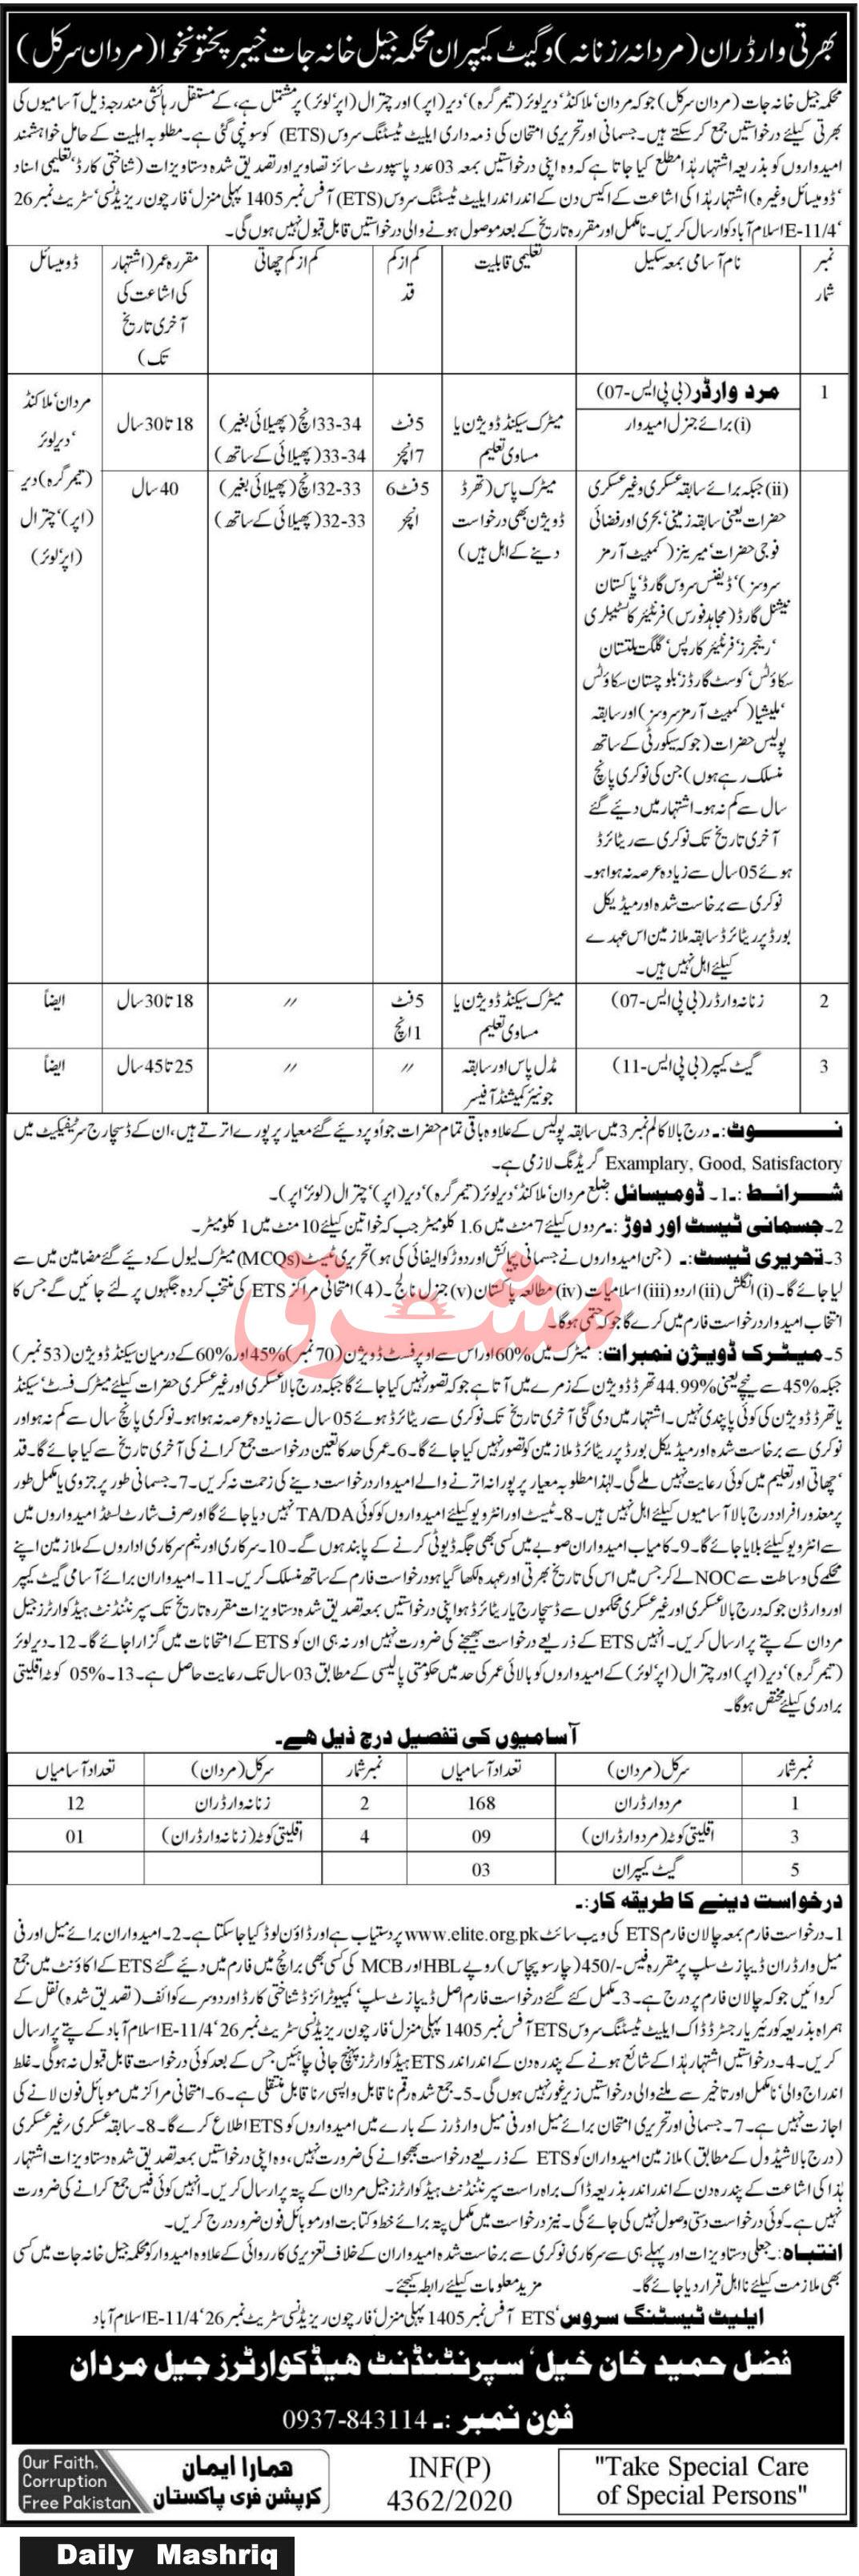 Jail Department jobs newspaper ad for Warden in Mardan